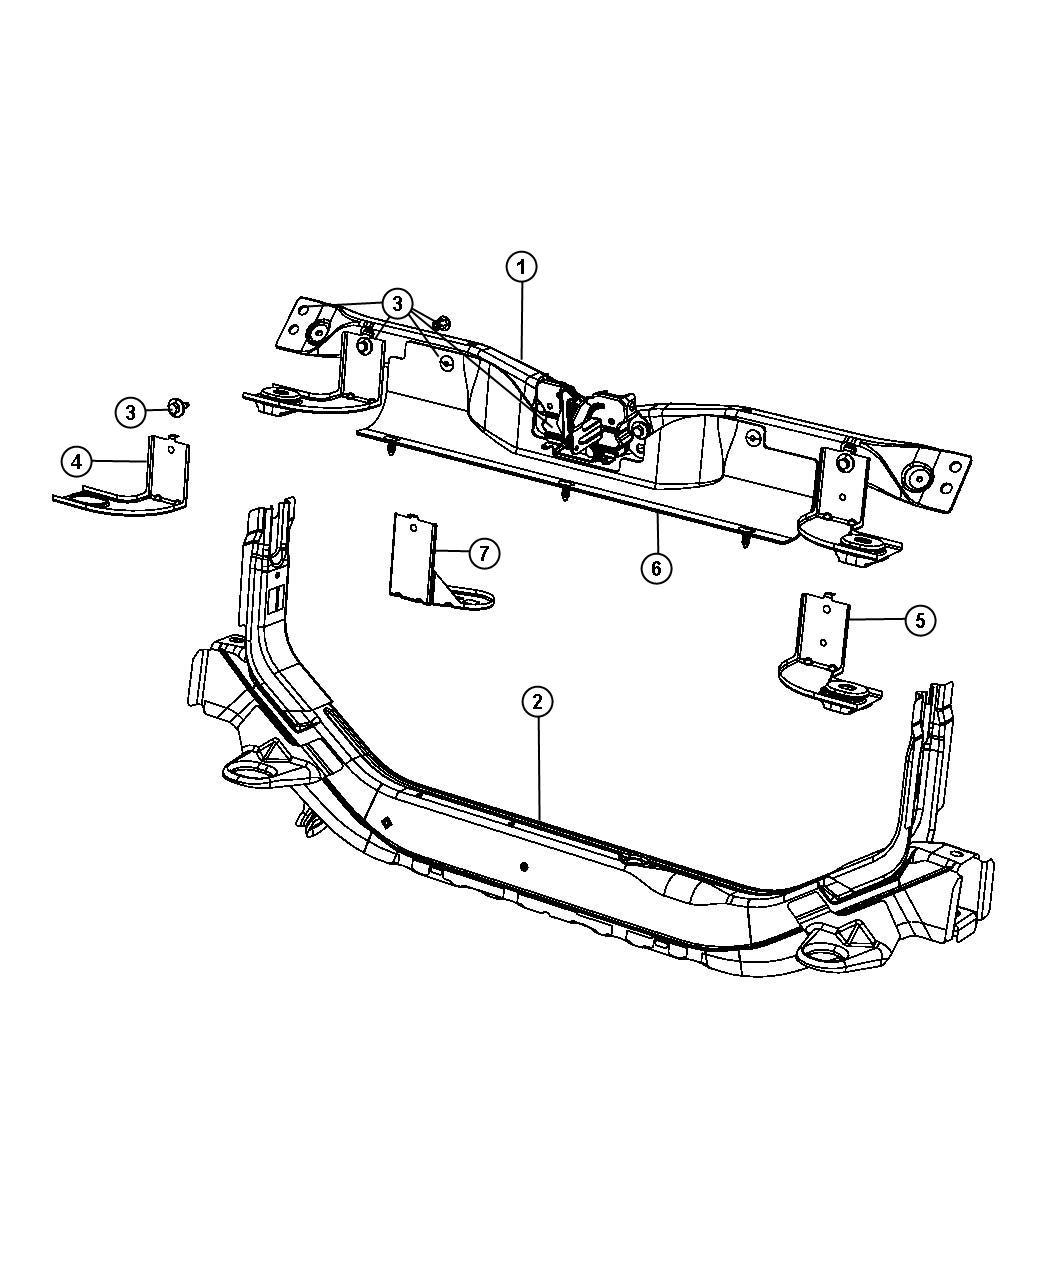 tags: #jeep patriot transmission problems#diagram jeep patriot clutch#jeep  patriot transmission diagram#jeep patriot drivetrain diagram#patriot jeep